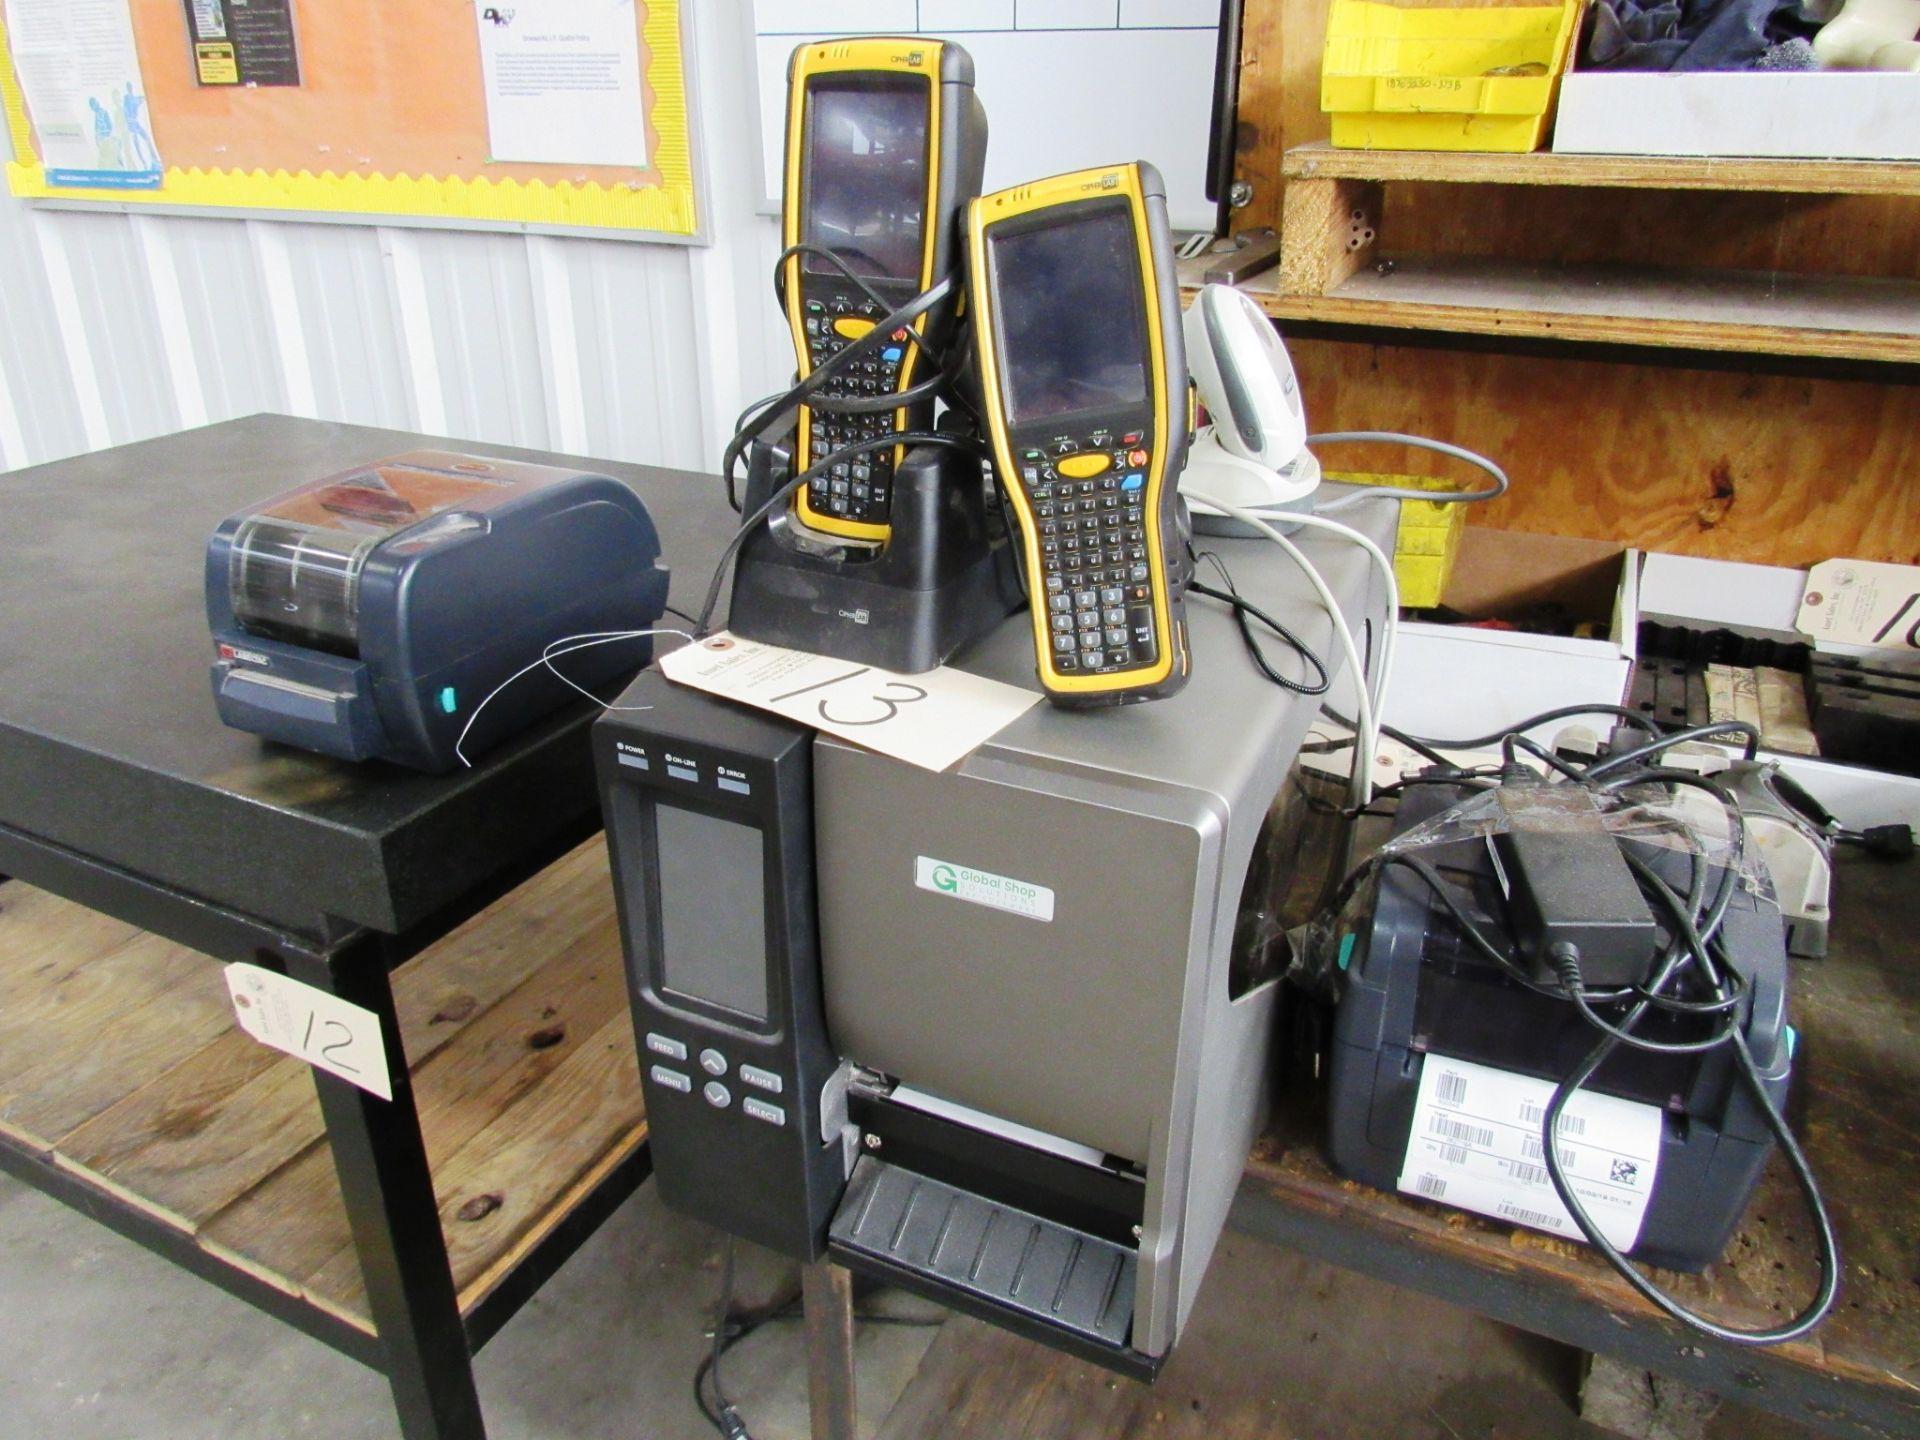 Lot 13 - Global Shop Model GSS-Label-PTR-1 Barcode & Printer Inventory System